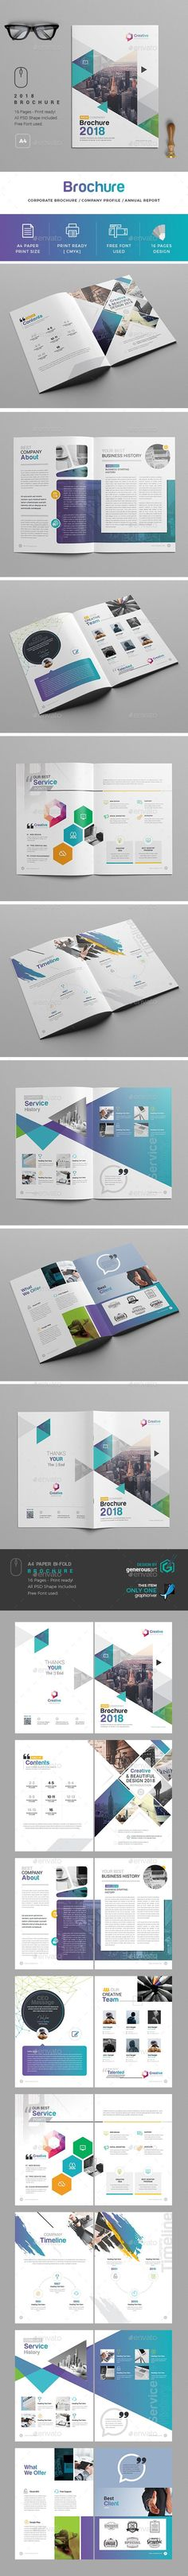 2018 Brochure - Brochures Print Templates